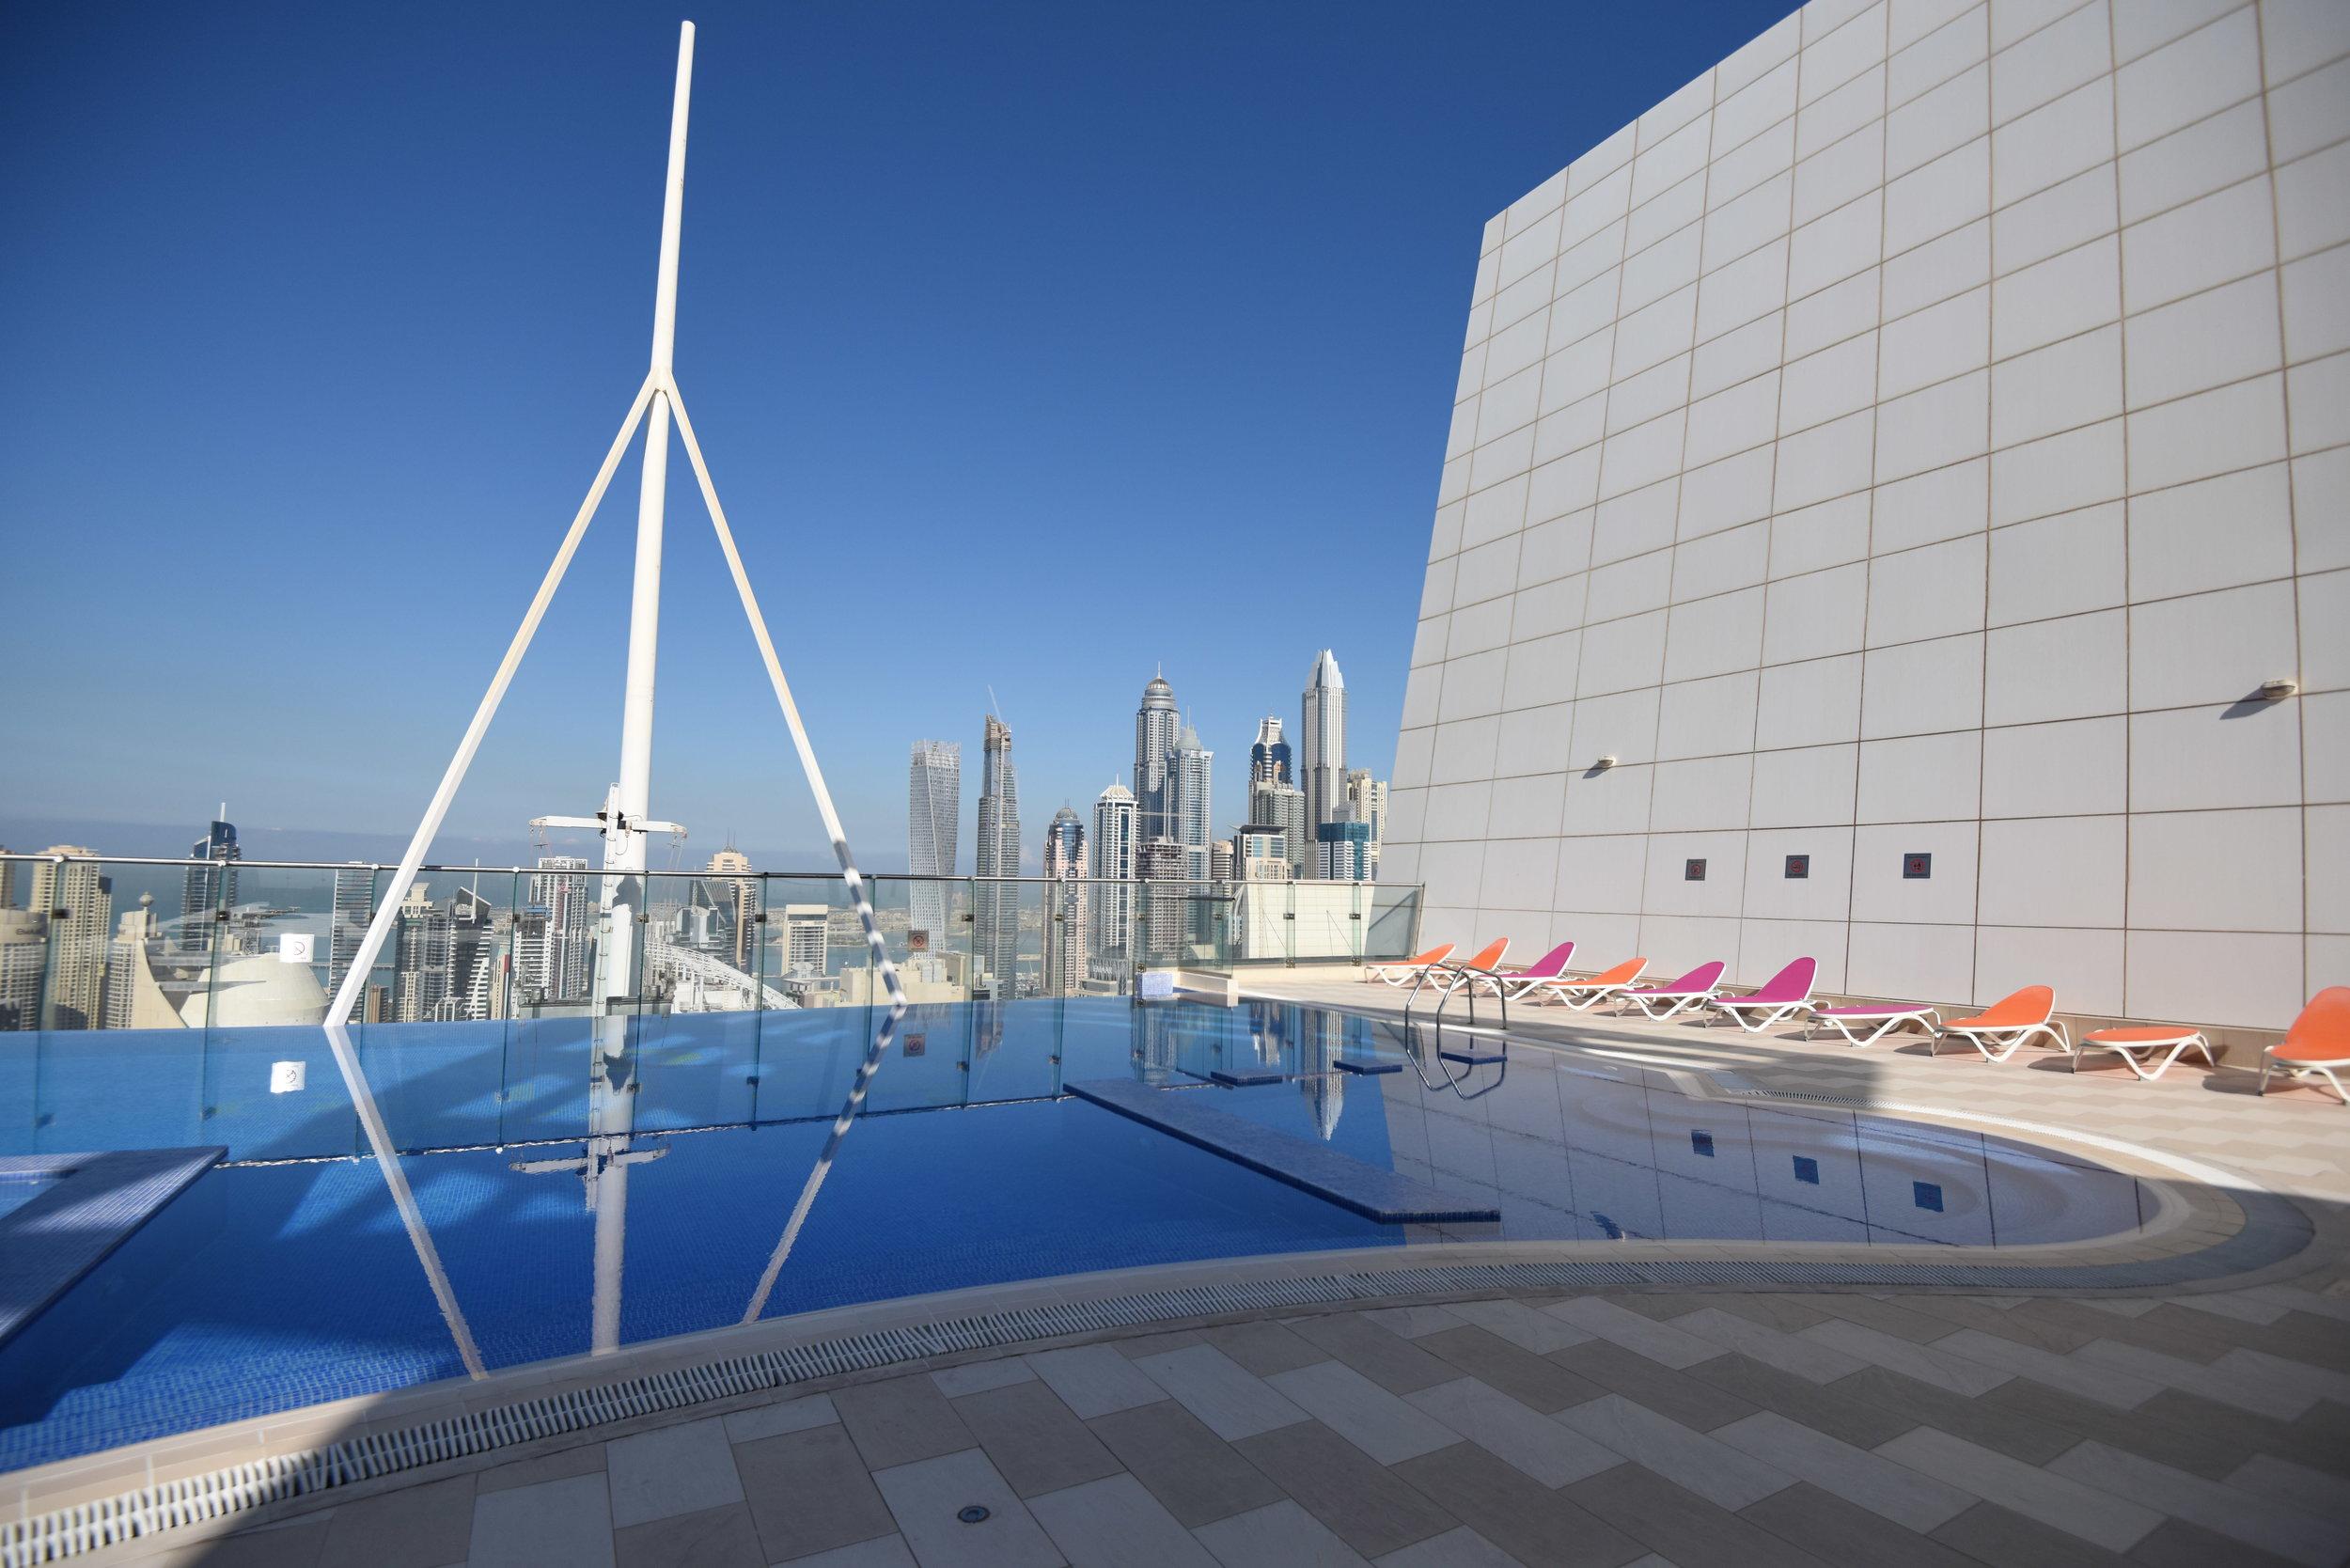 Roof top pool with views of Dubai Marina and the spectacular Dubai skyline